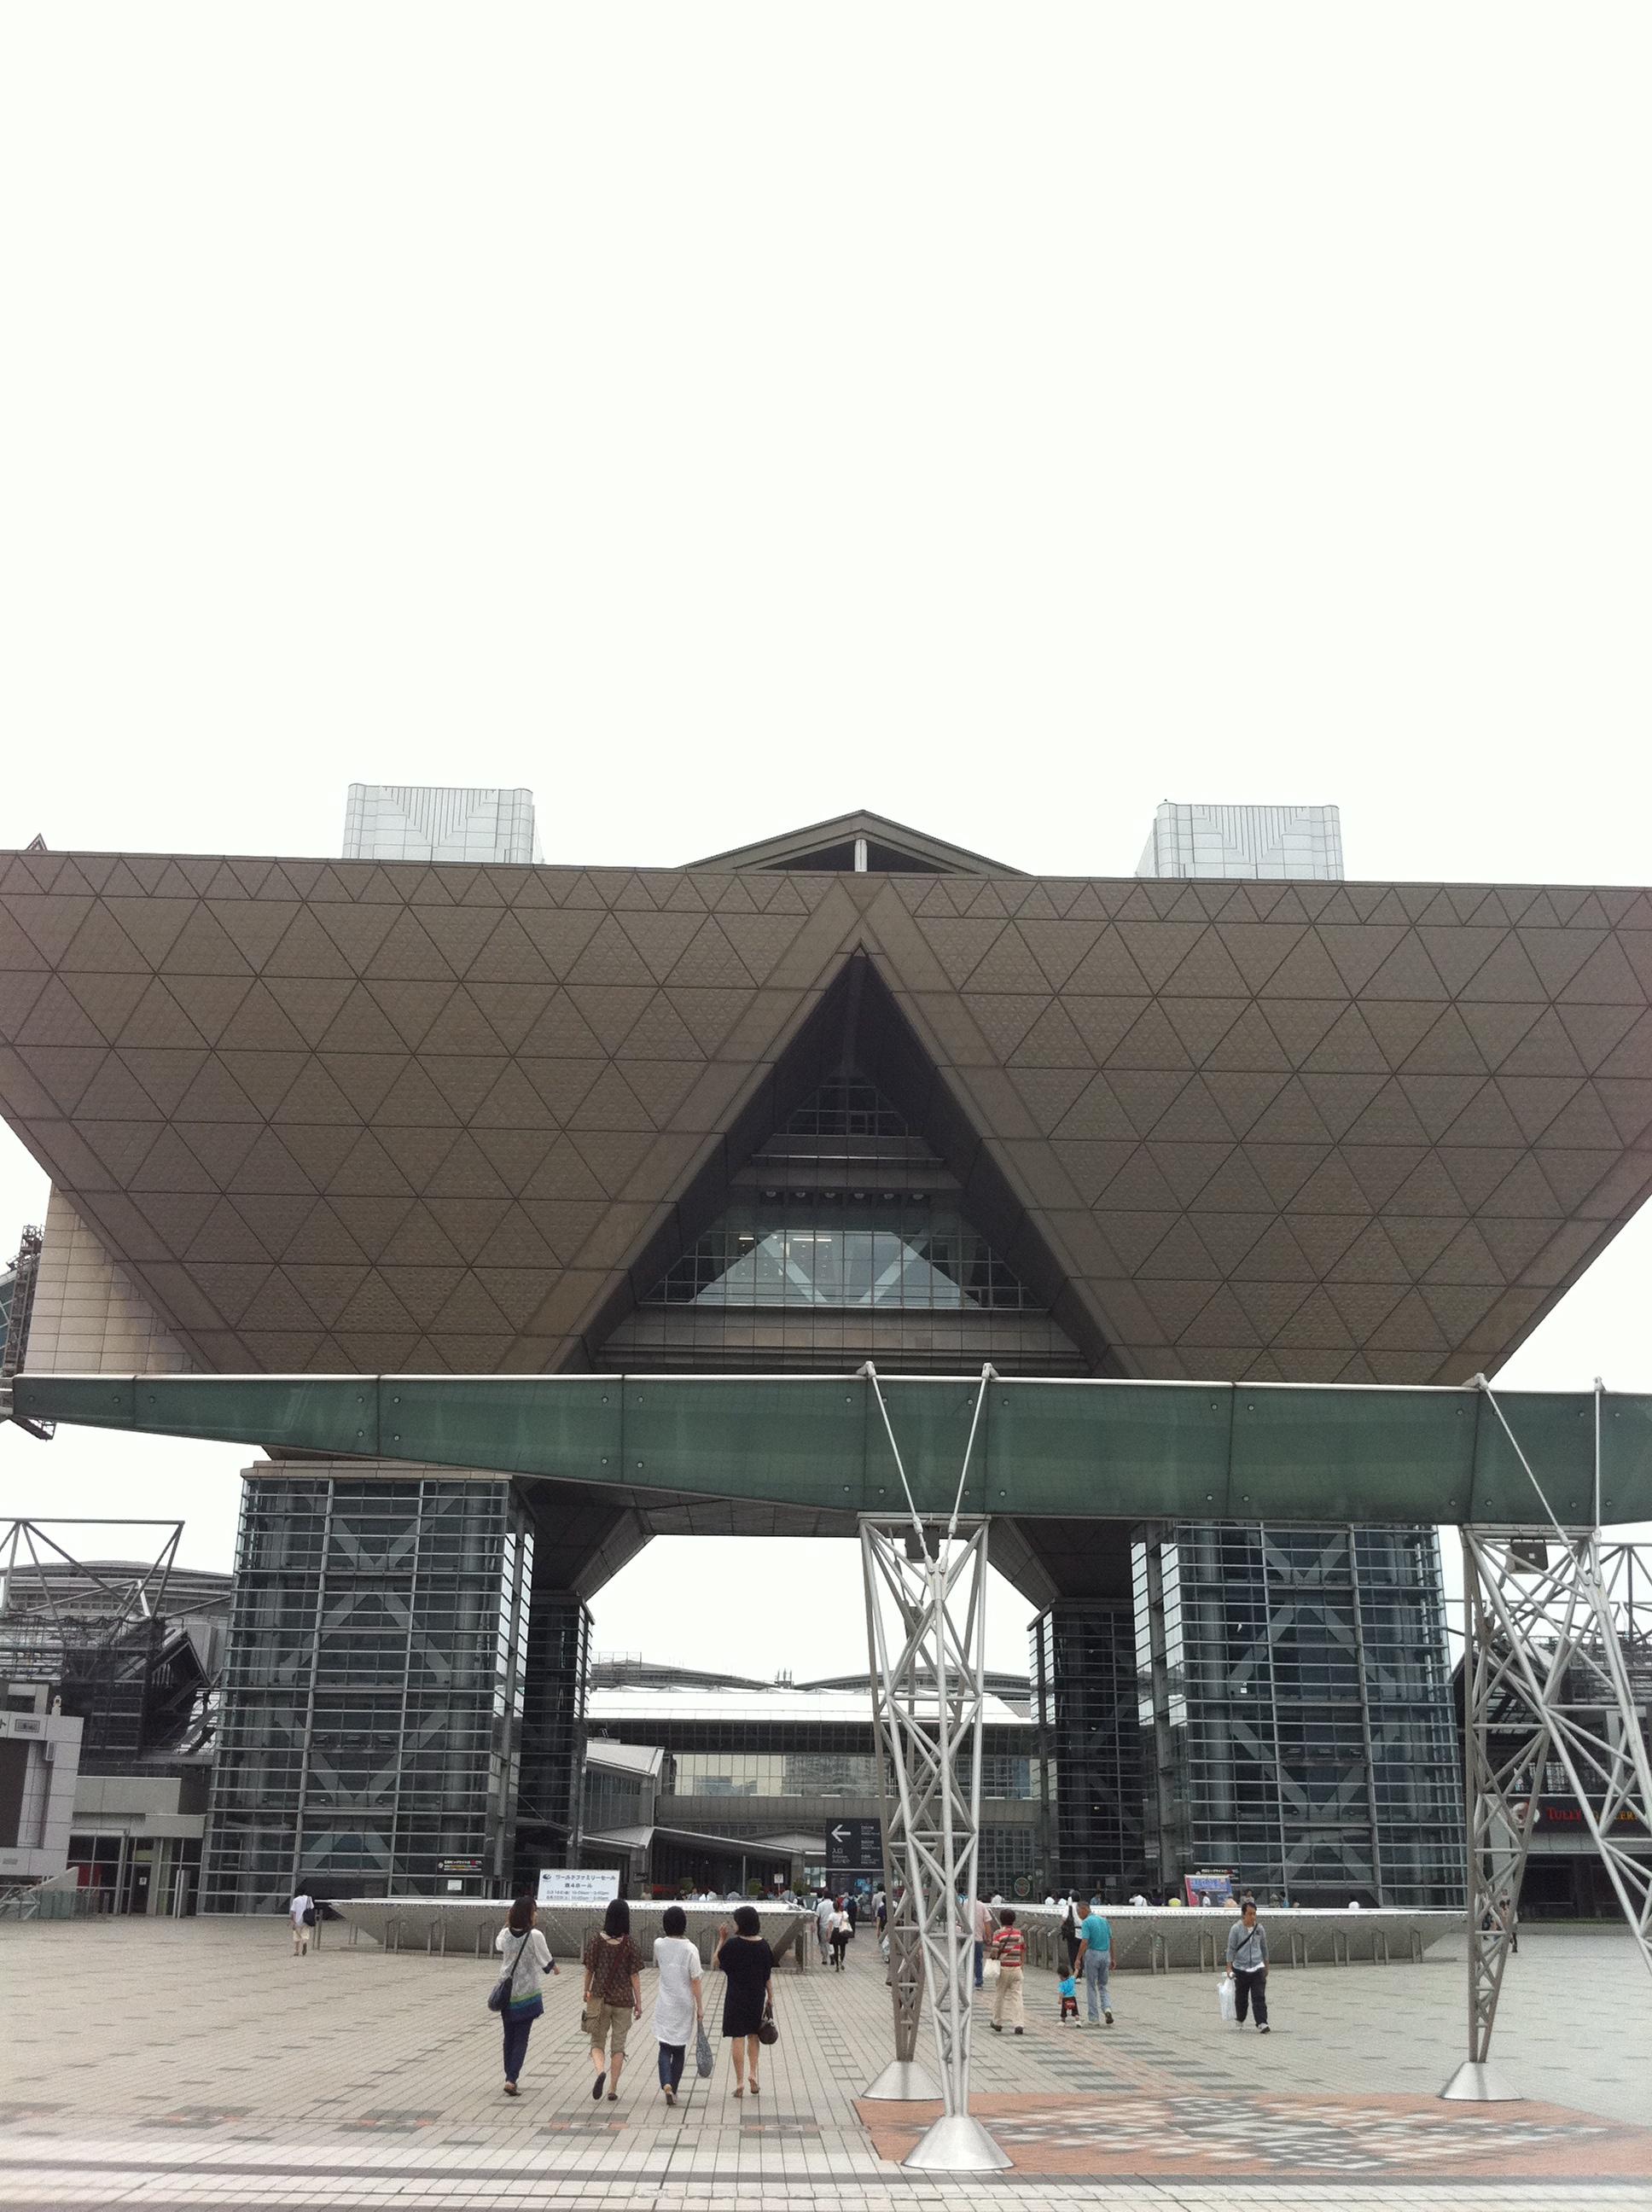 Tokyo Big Sight (Tokyo International Exhibition Center) image8